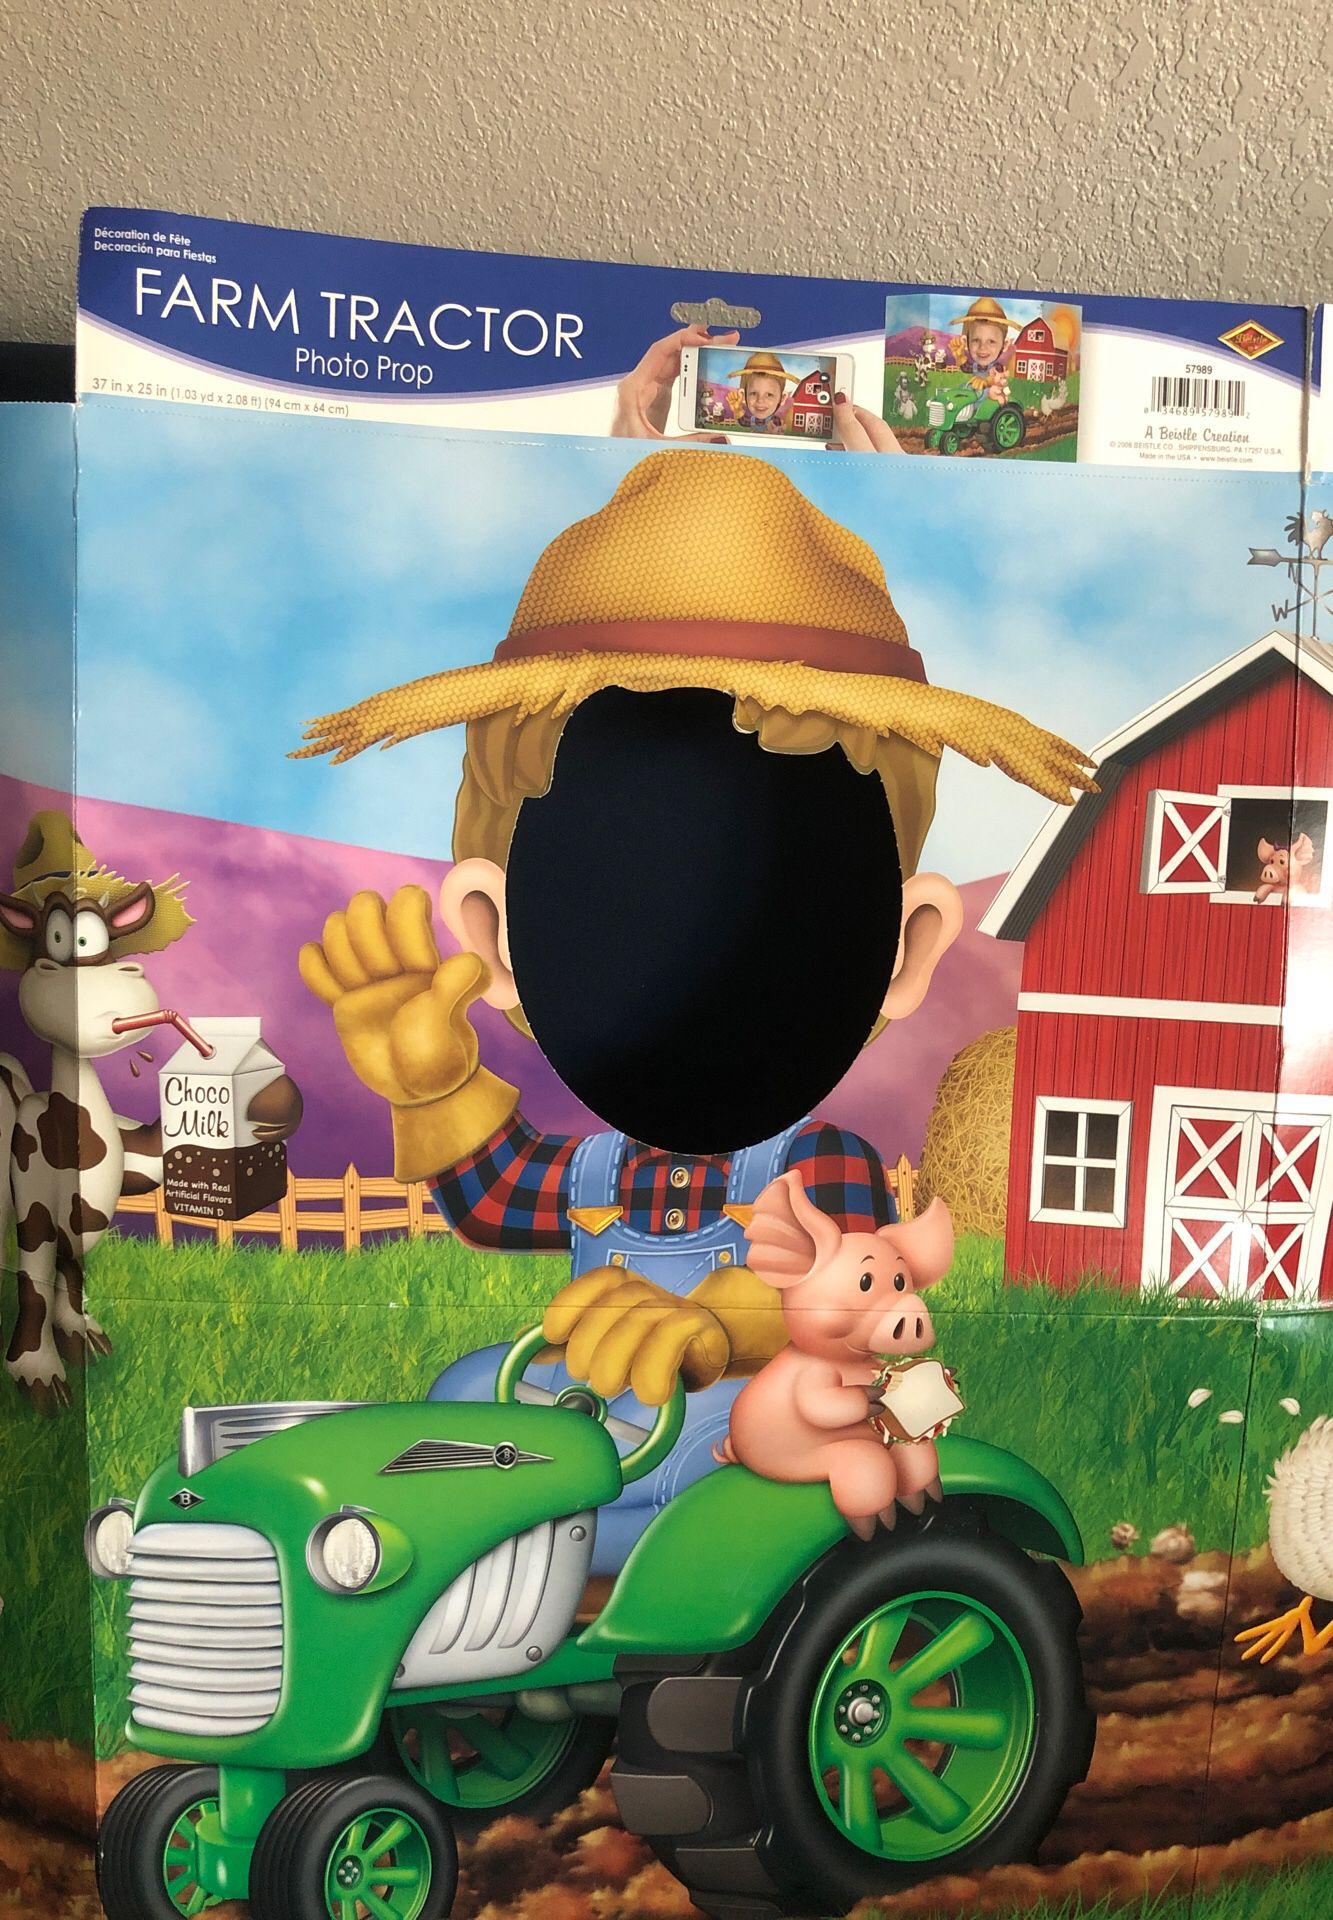 Farm Tractor Photo Prop - New